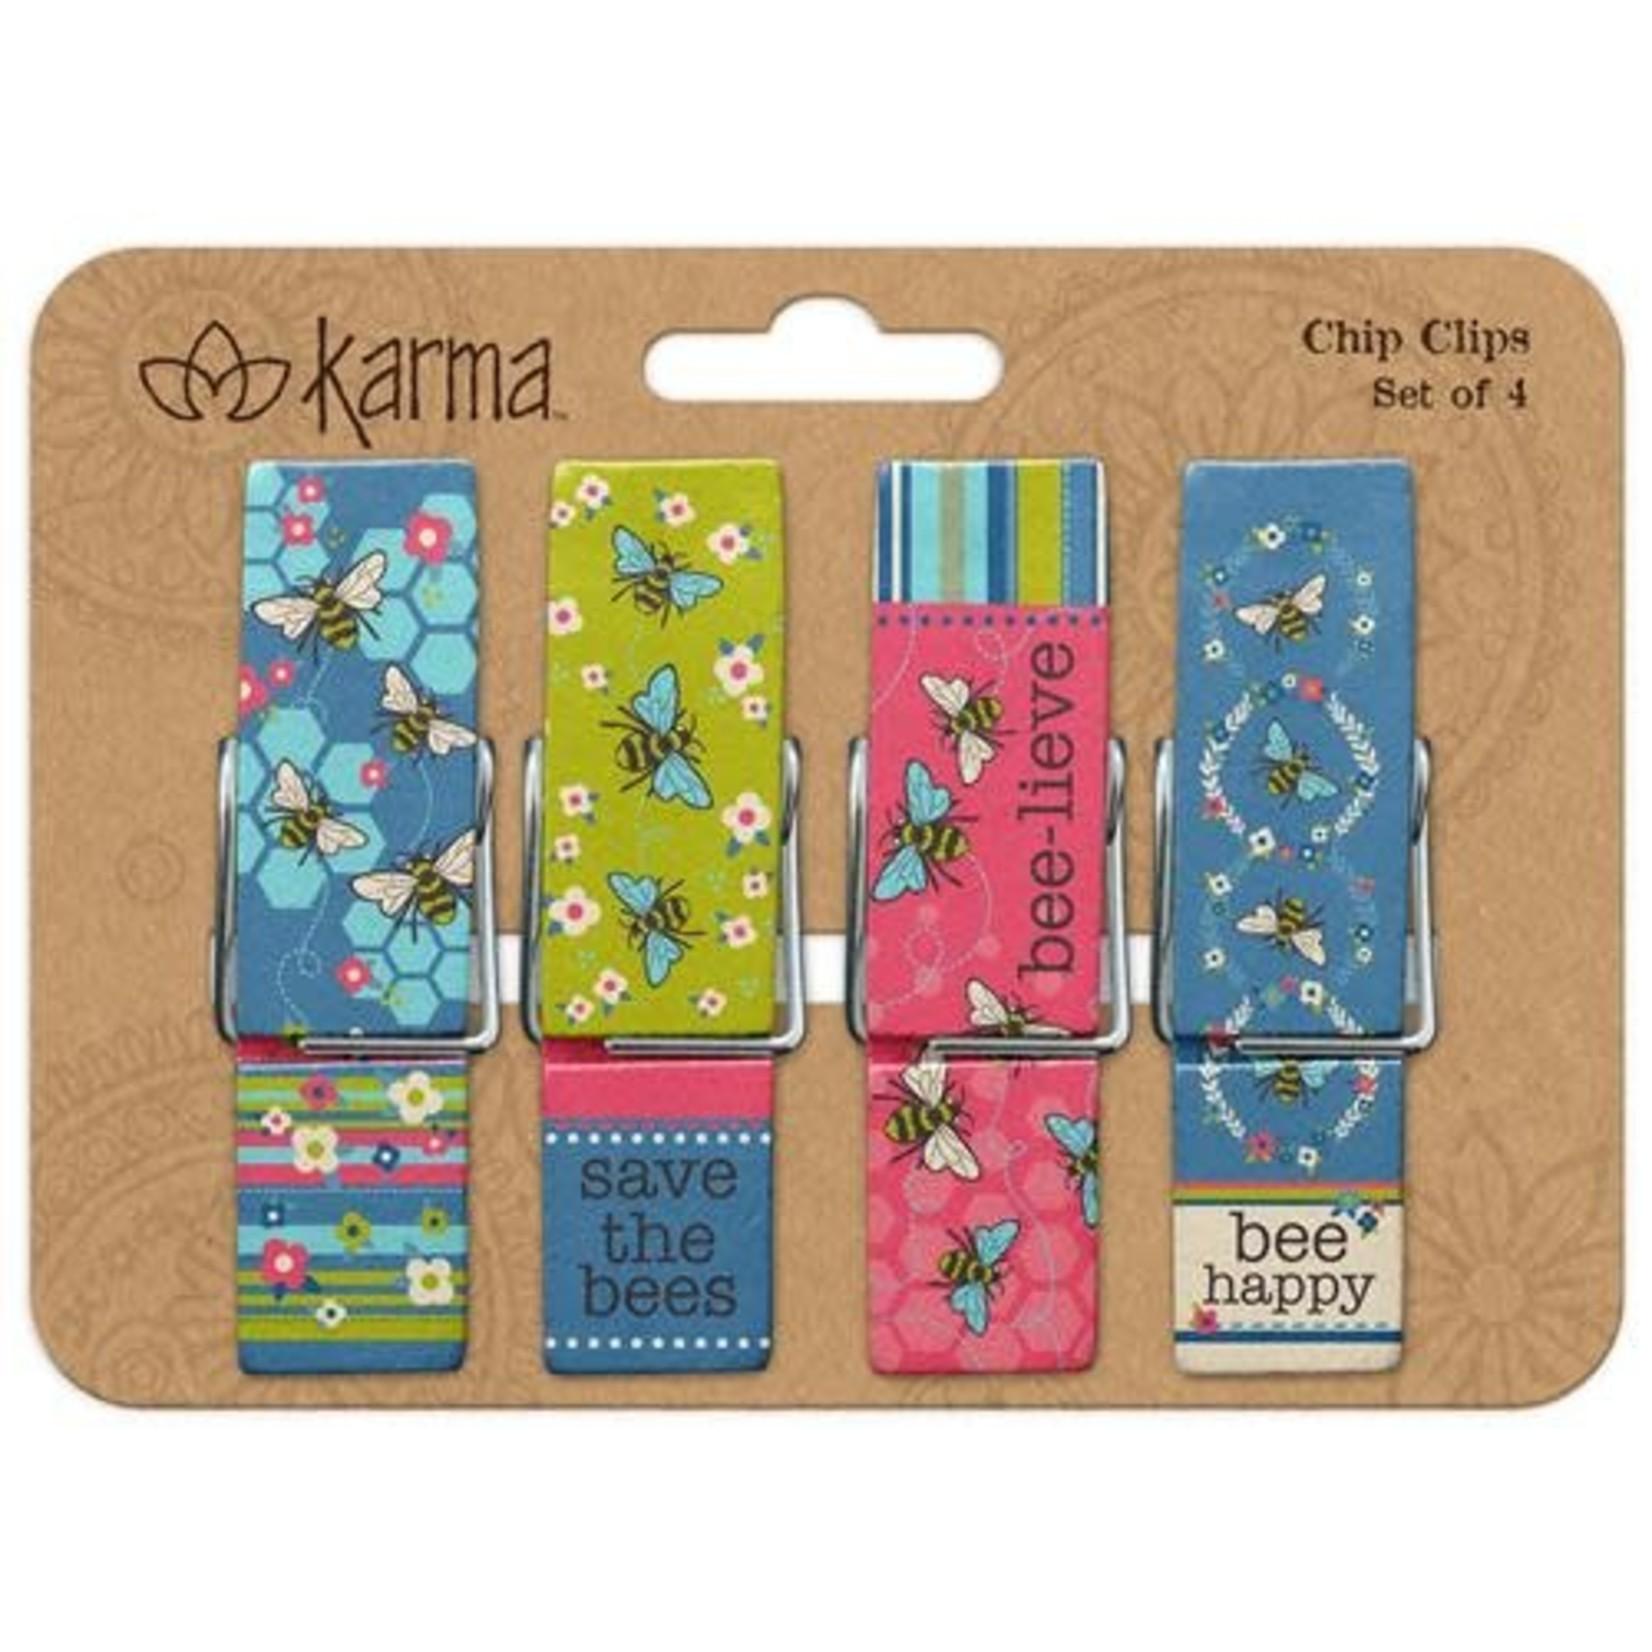 Karma CHIP CLIPS SUGAR BEE (F17)